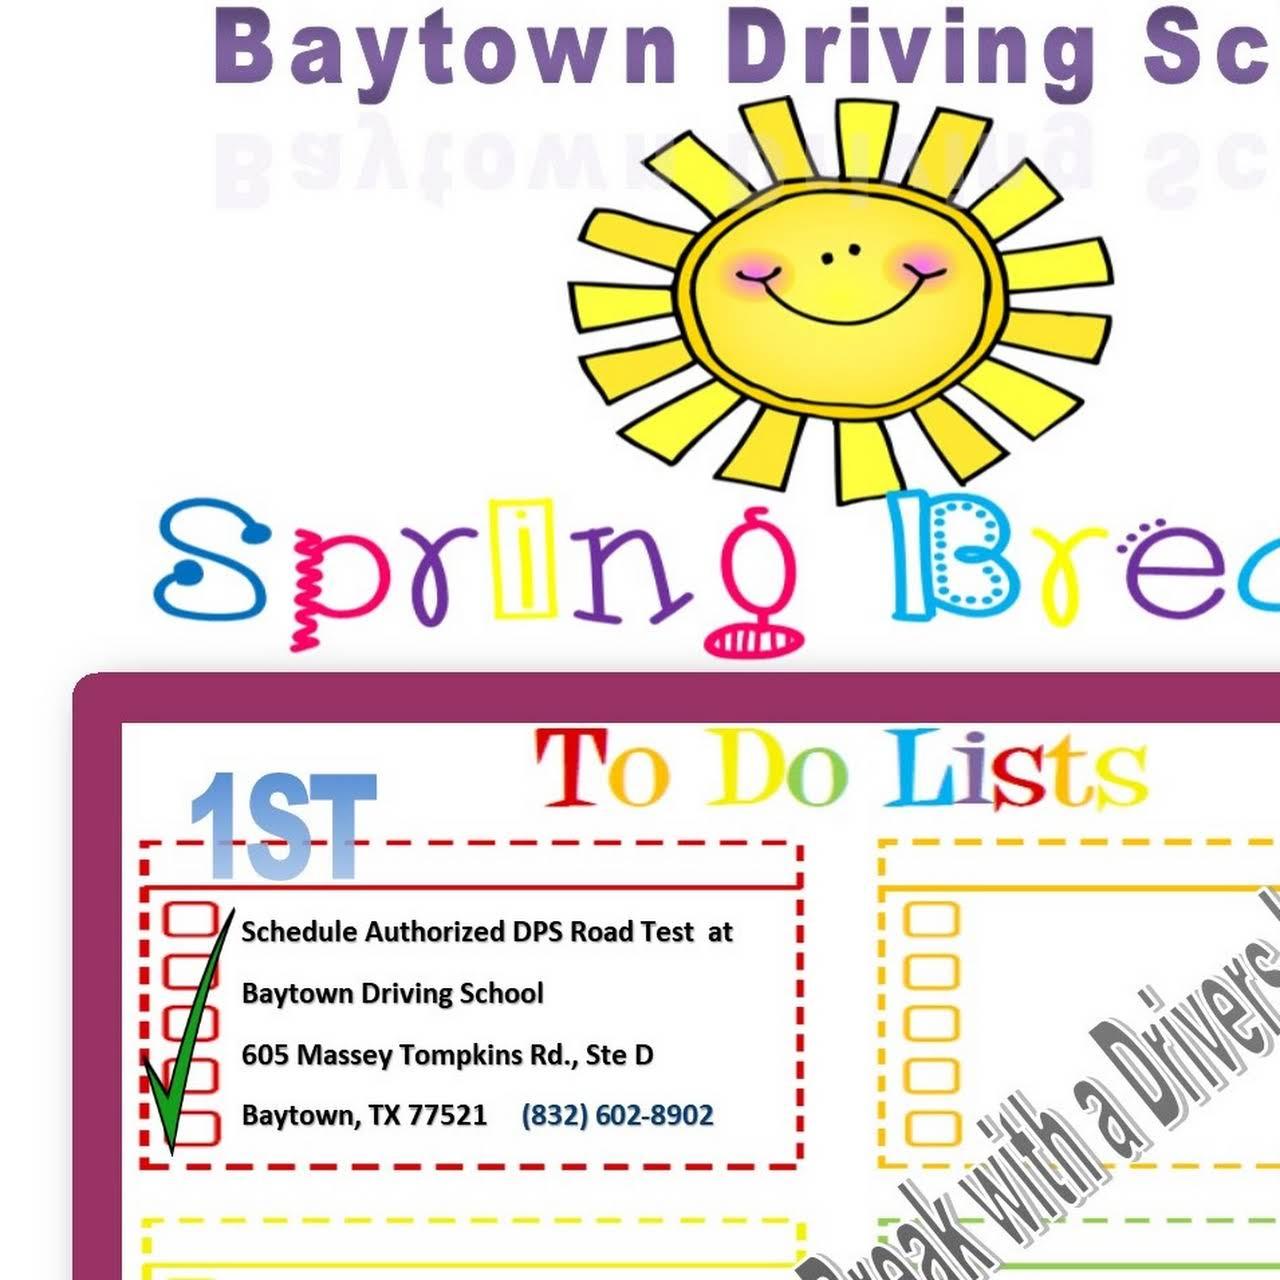 Baytown Driving School - Driving School in Baytown